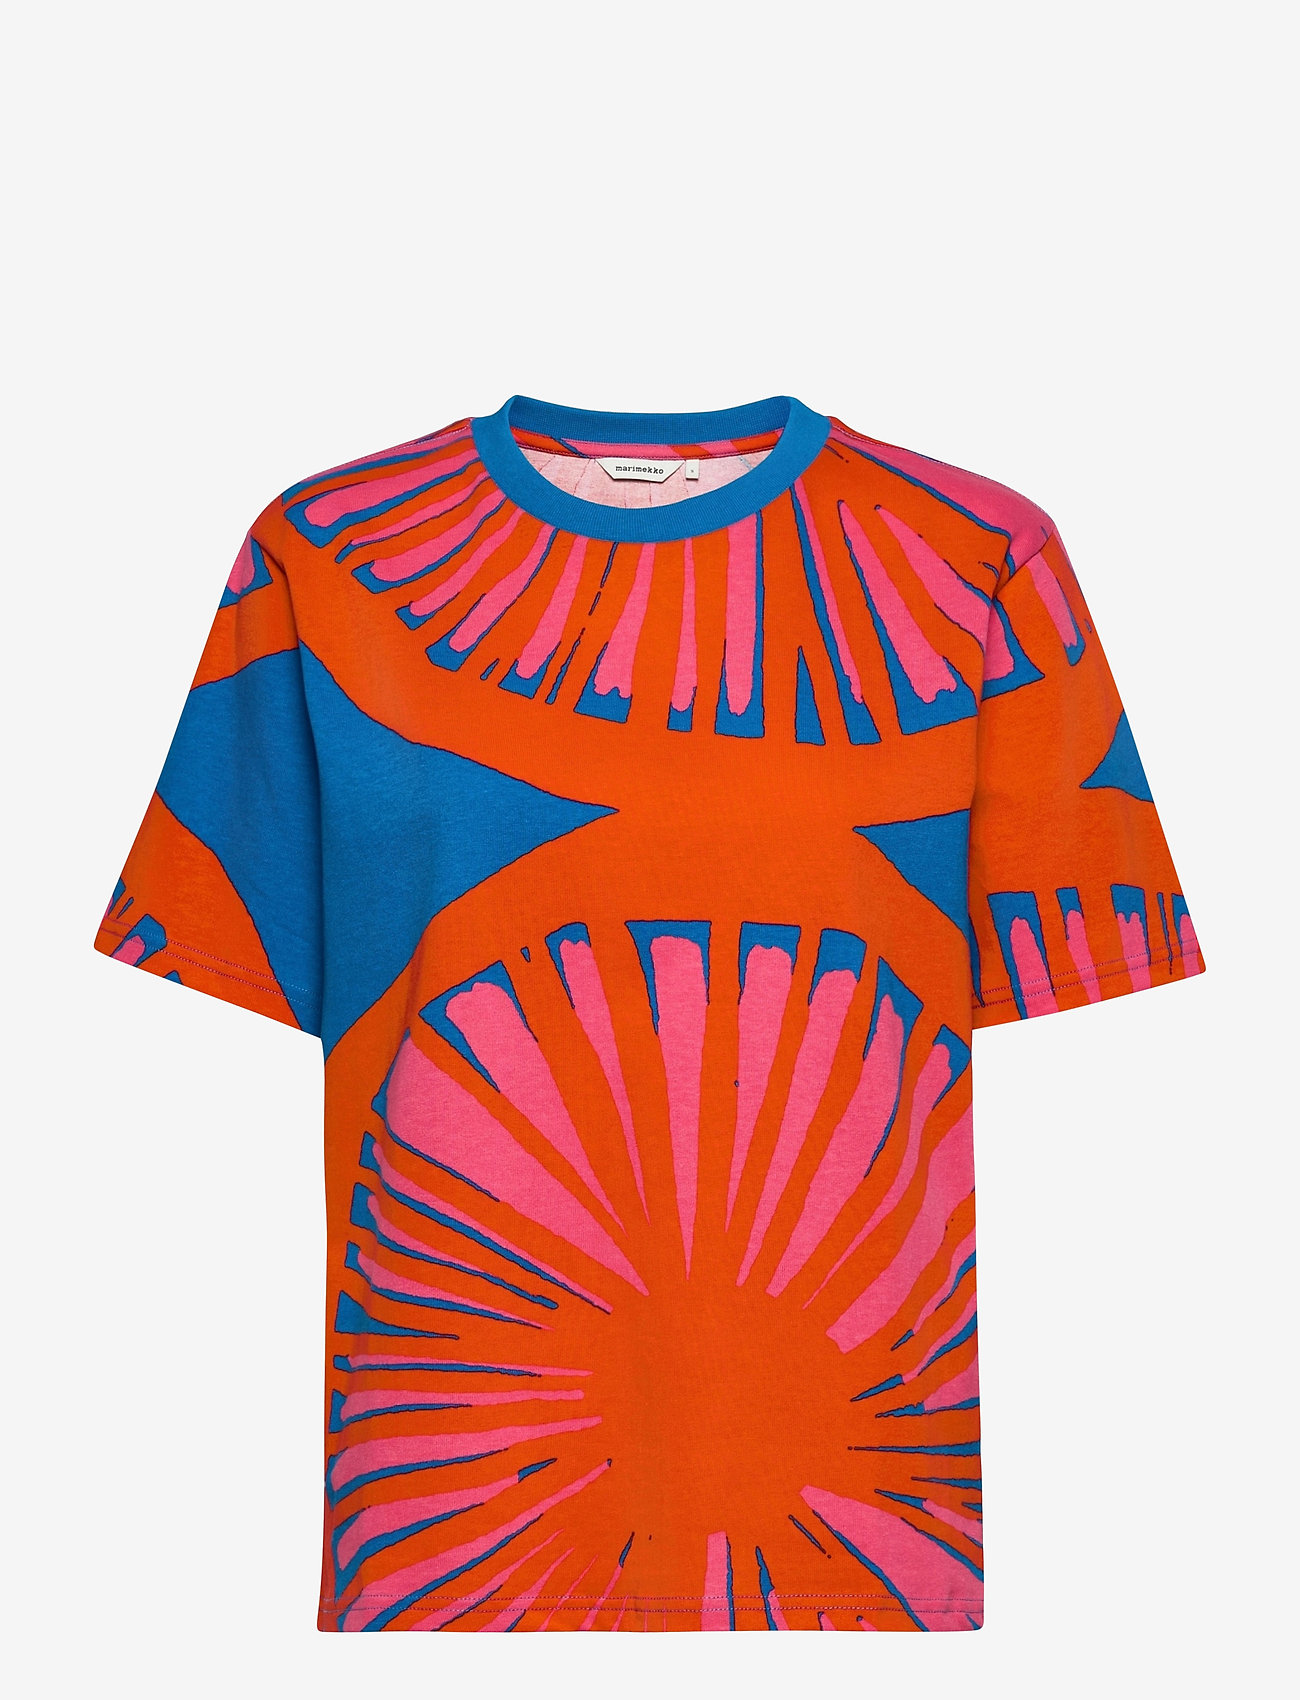 Marimekko - KUUSIKKO APPELSIINI T-SHIRT - t-shirts - bright blue, orange, pink - 1